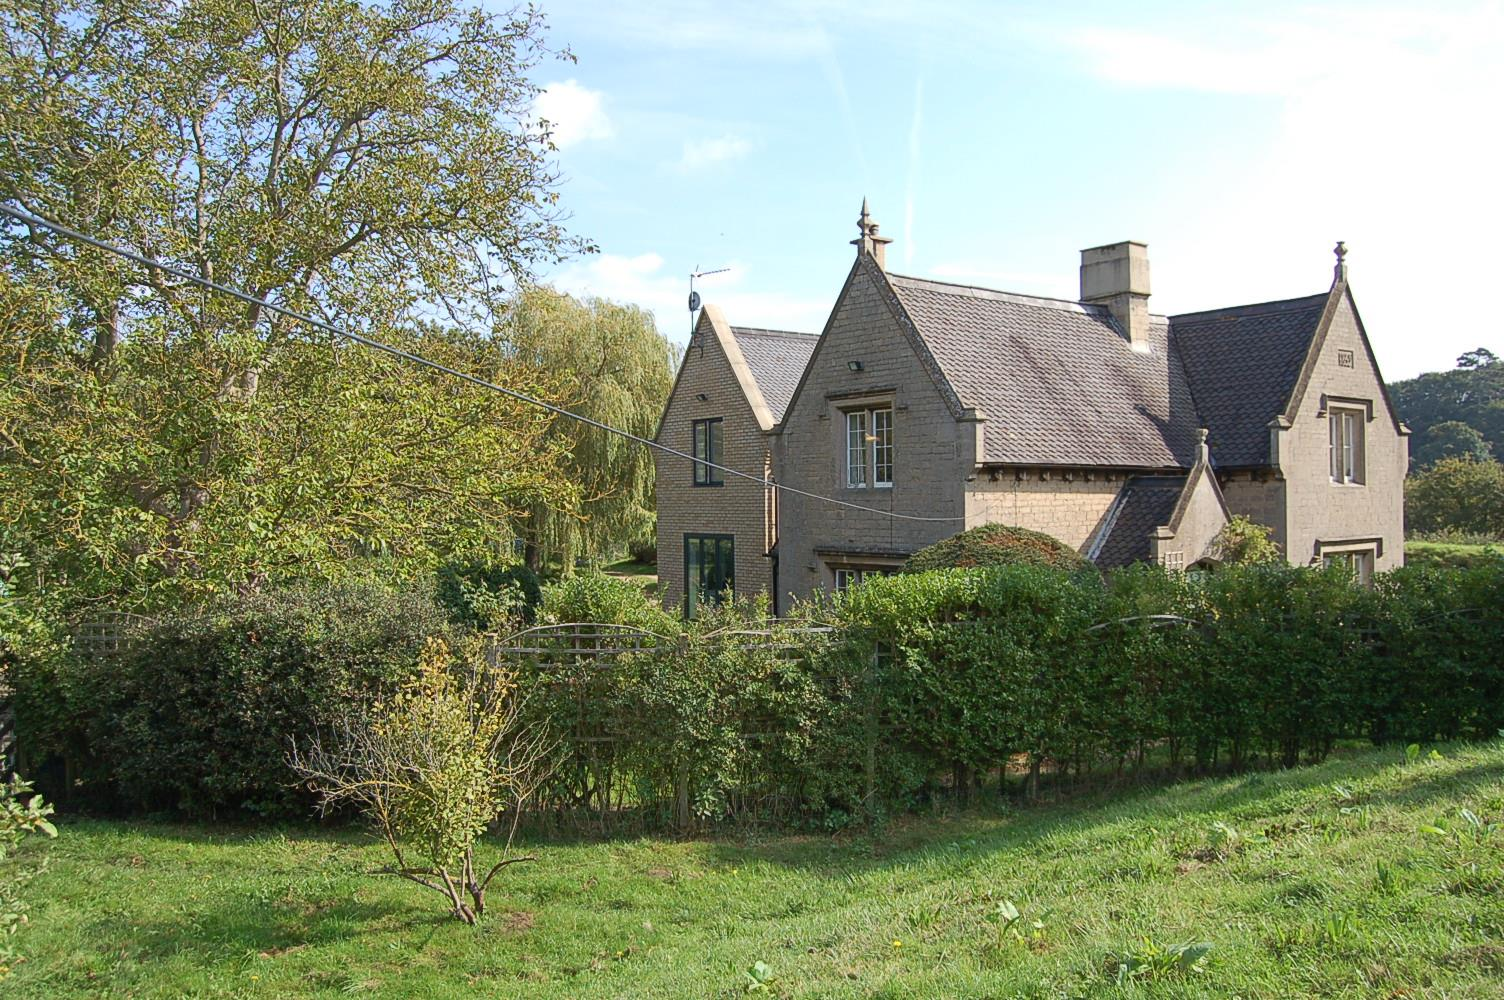 Rauceby Drove, South Rauceby